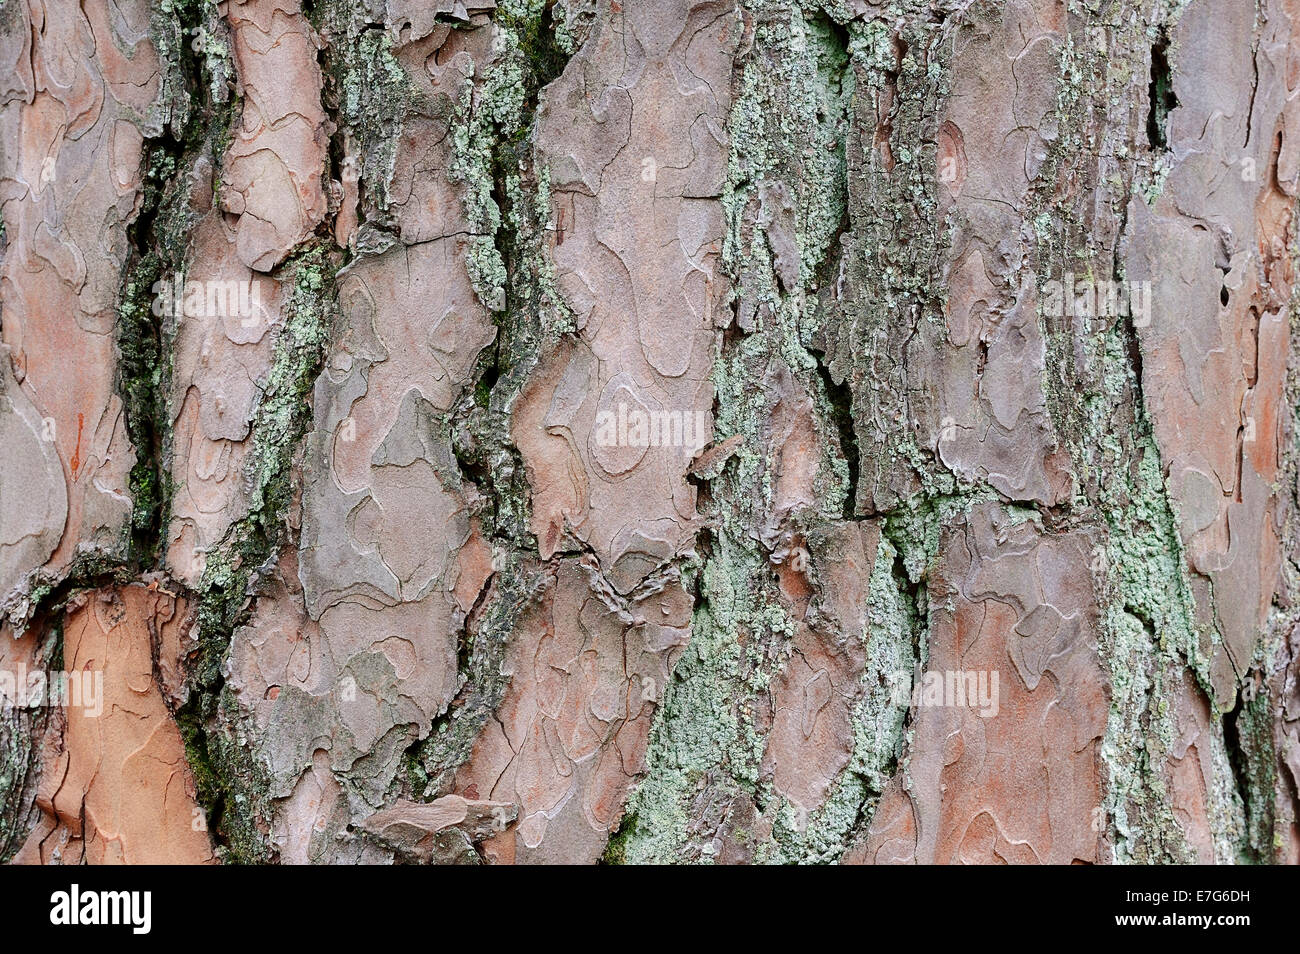 Scots Pine (Pinus sylvestris), bark, Netherlands - Stock Image